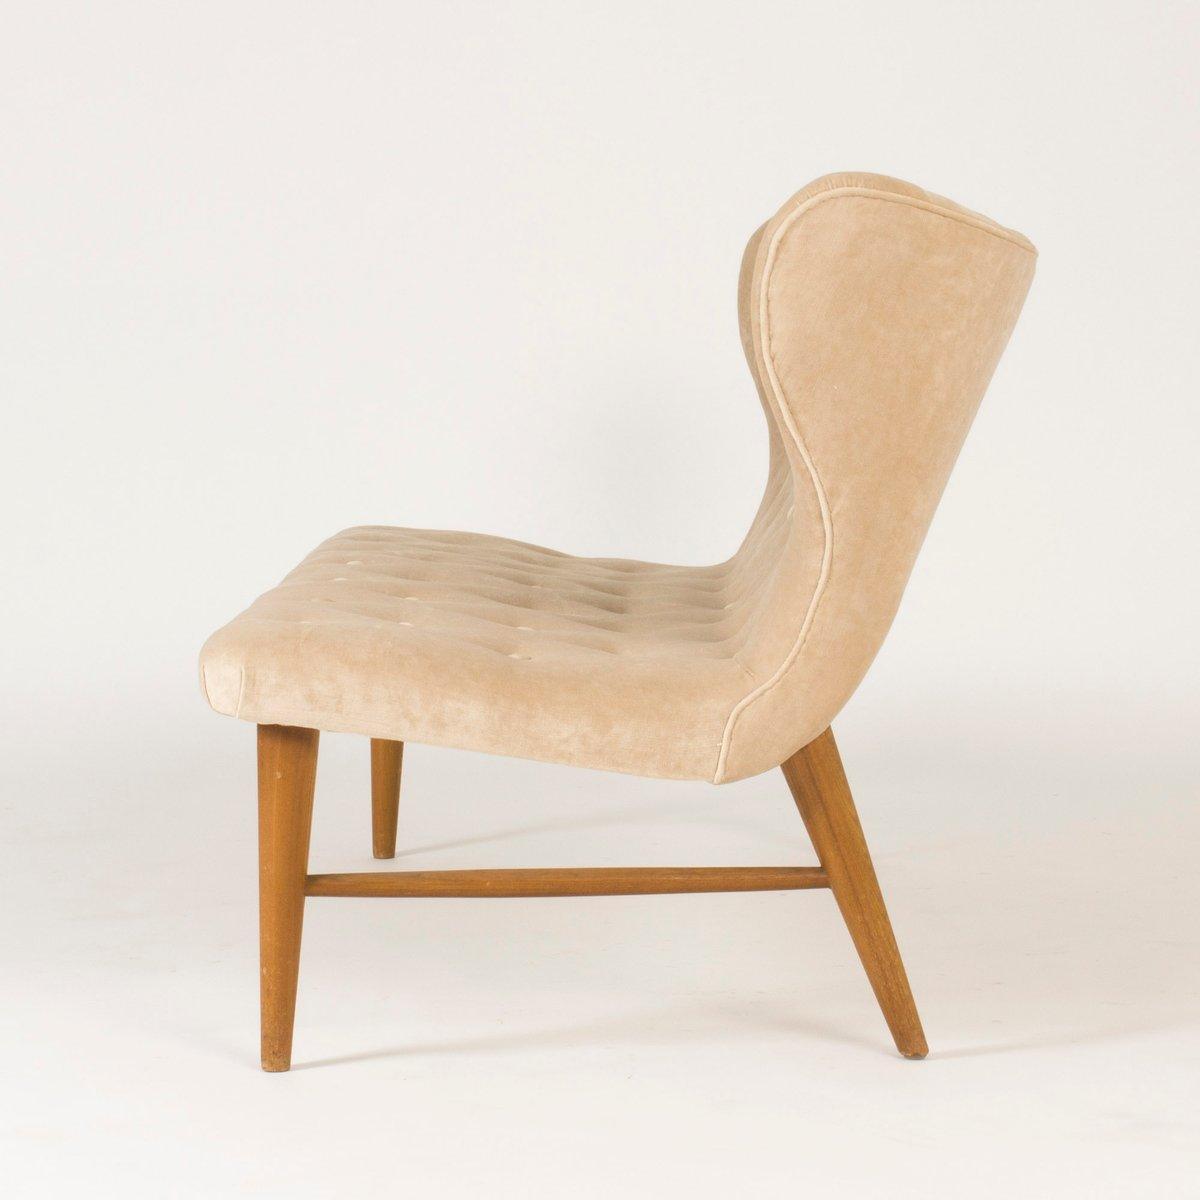 samtsofa von eric karl n f r firma rumsinter r 1940er bei. Black Bedroom Furniture Sets. Home Design Ideas